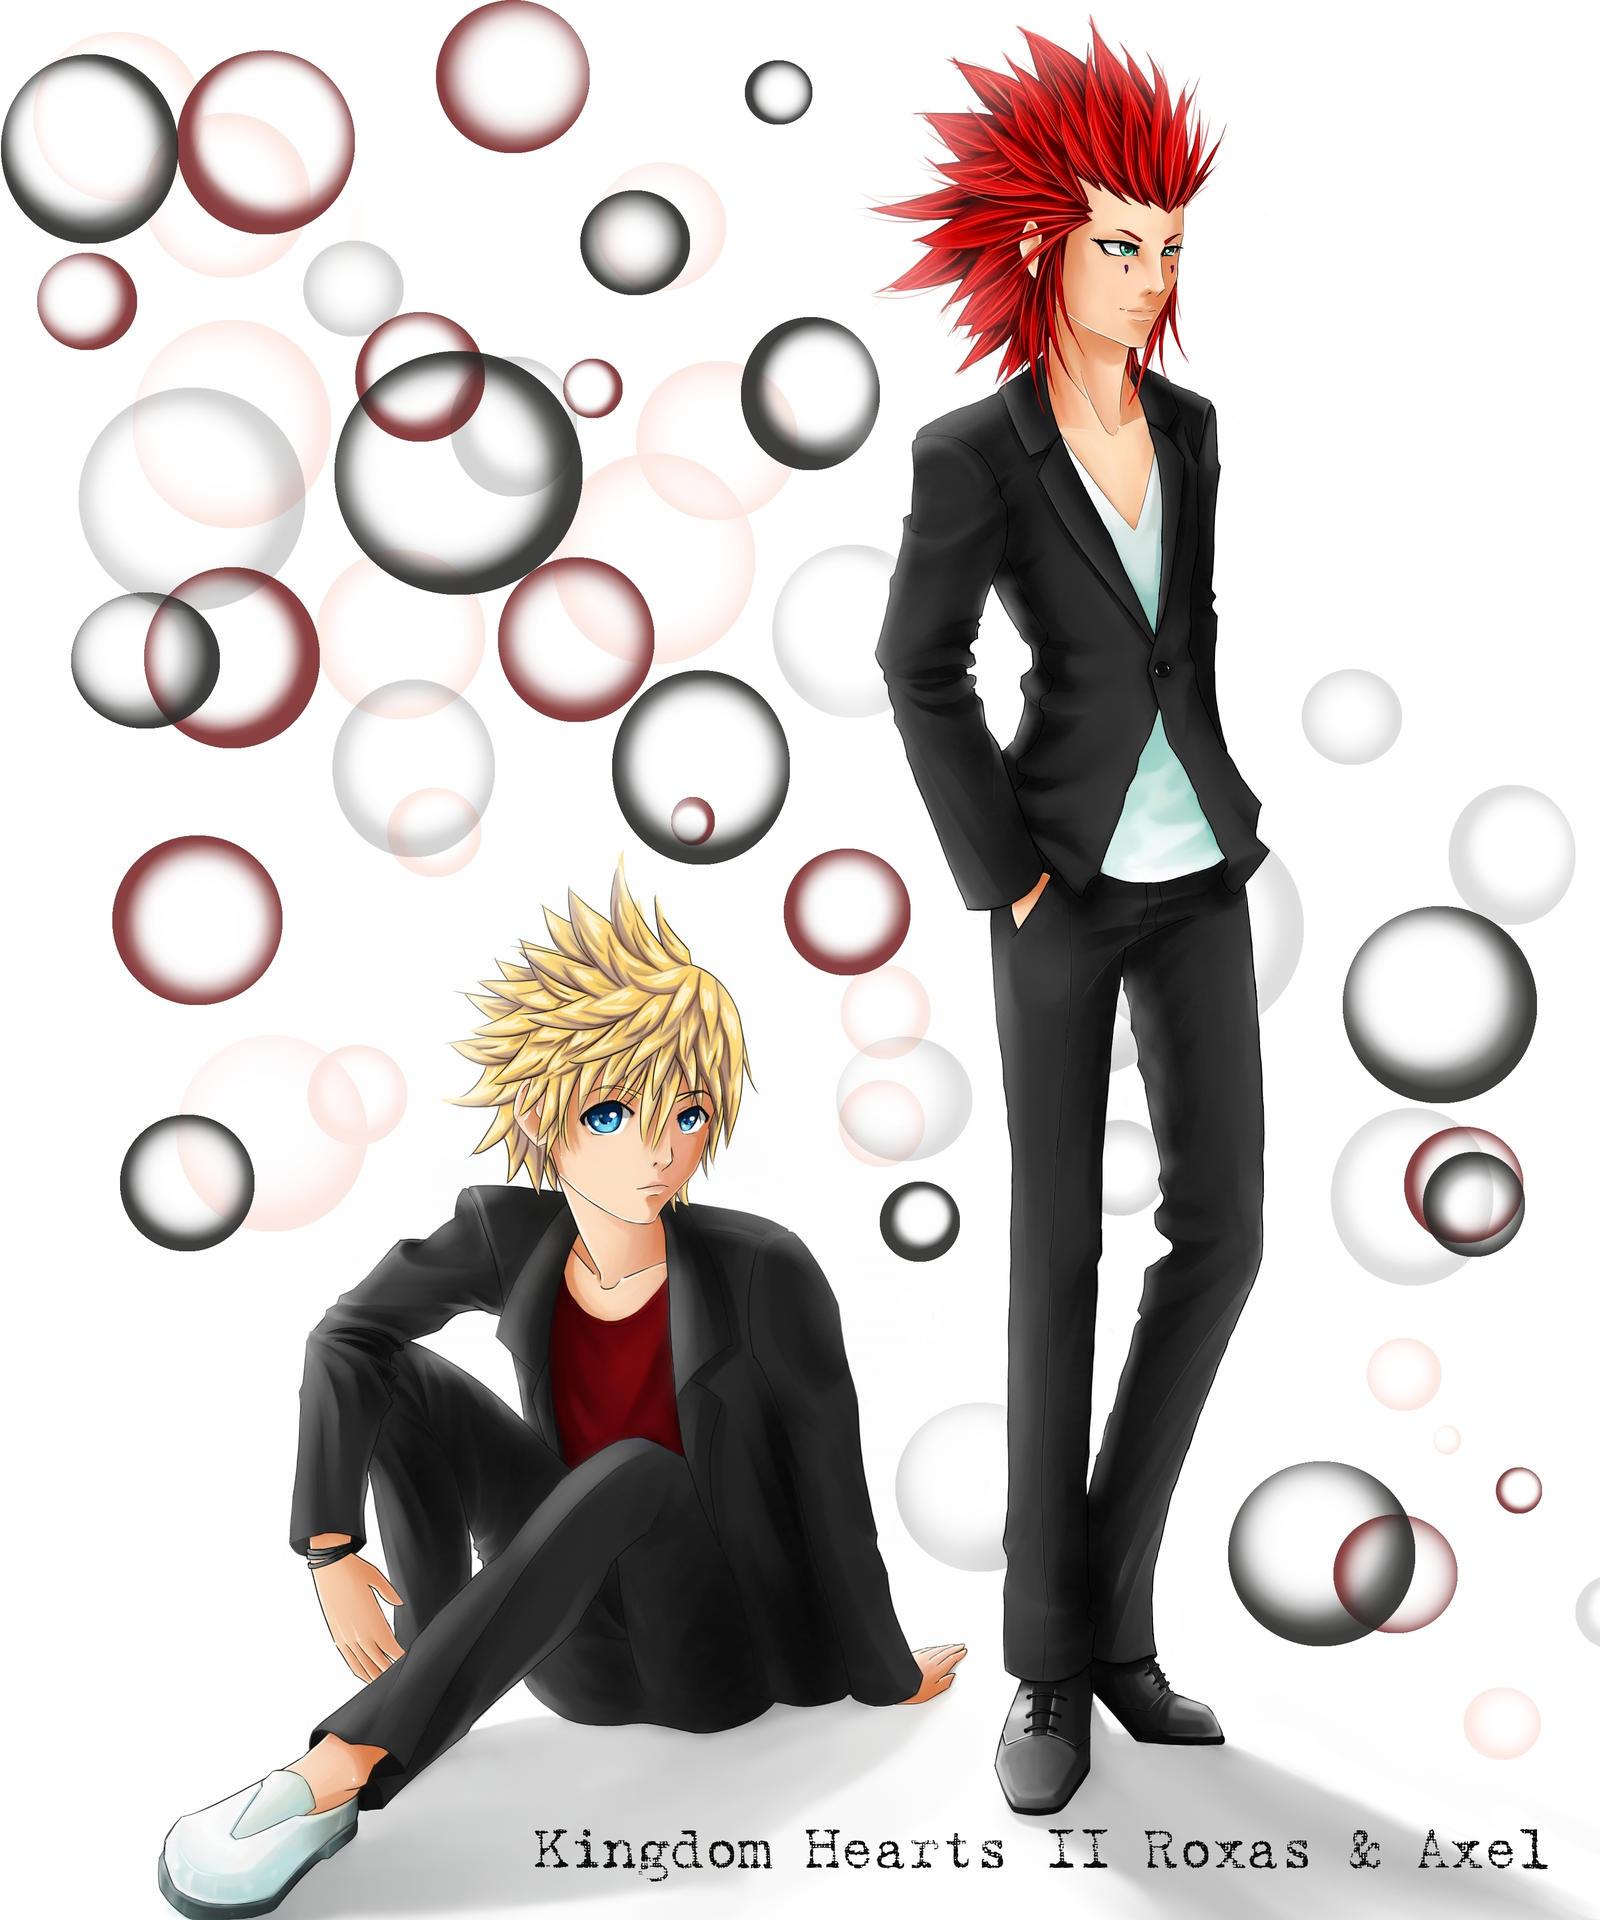 CP Kingdom Hearts II Roxas and Axel by SilverdragonAmai